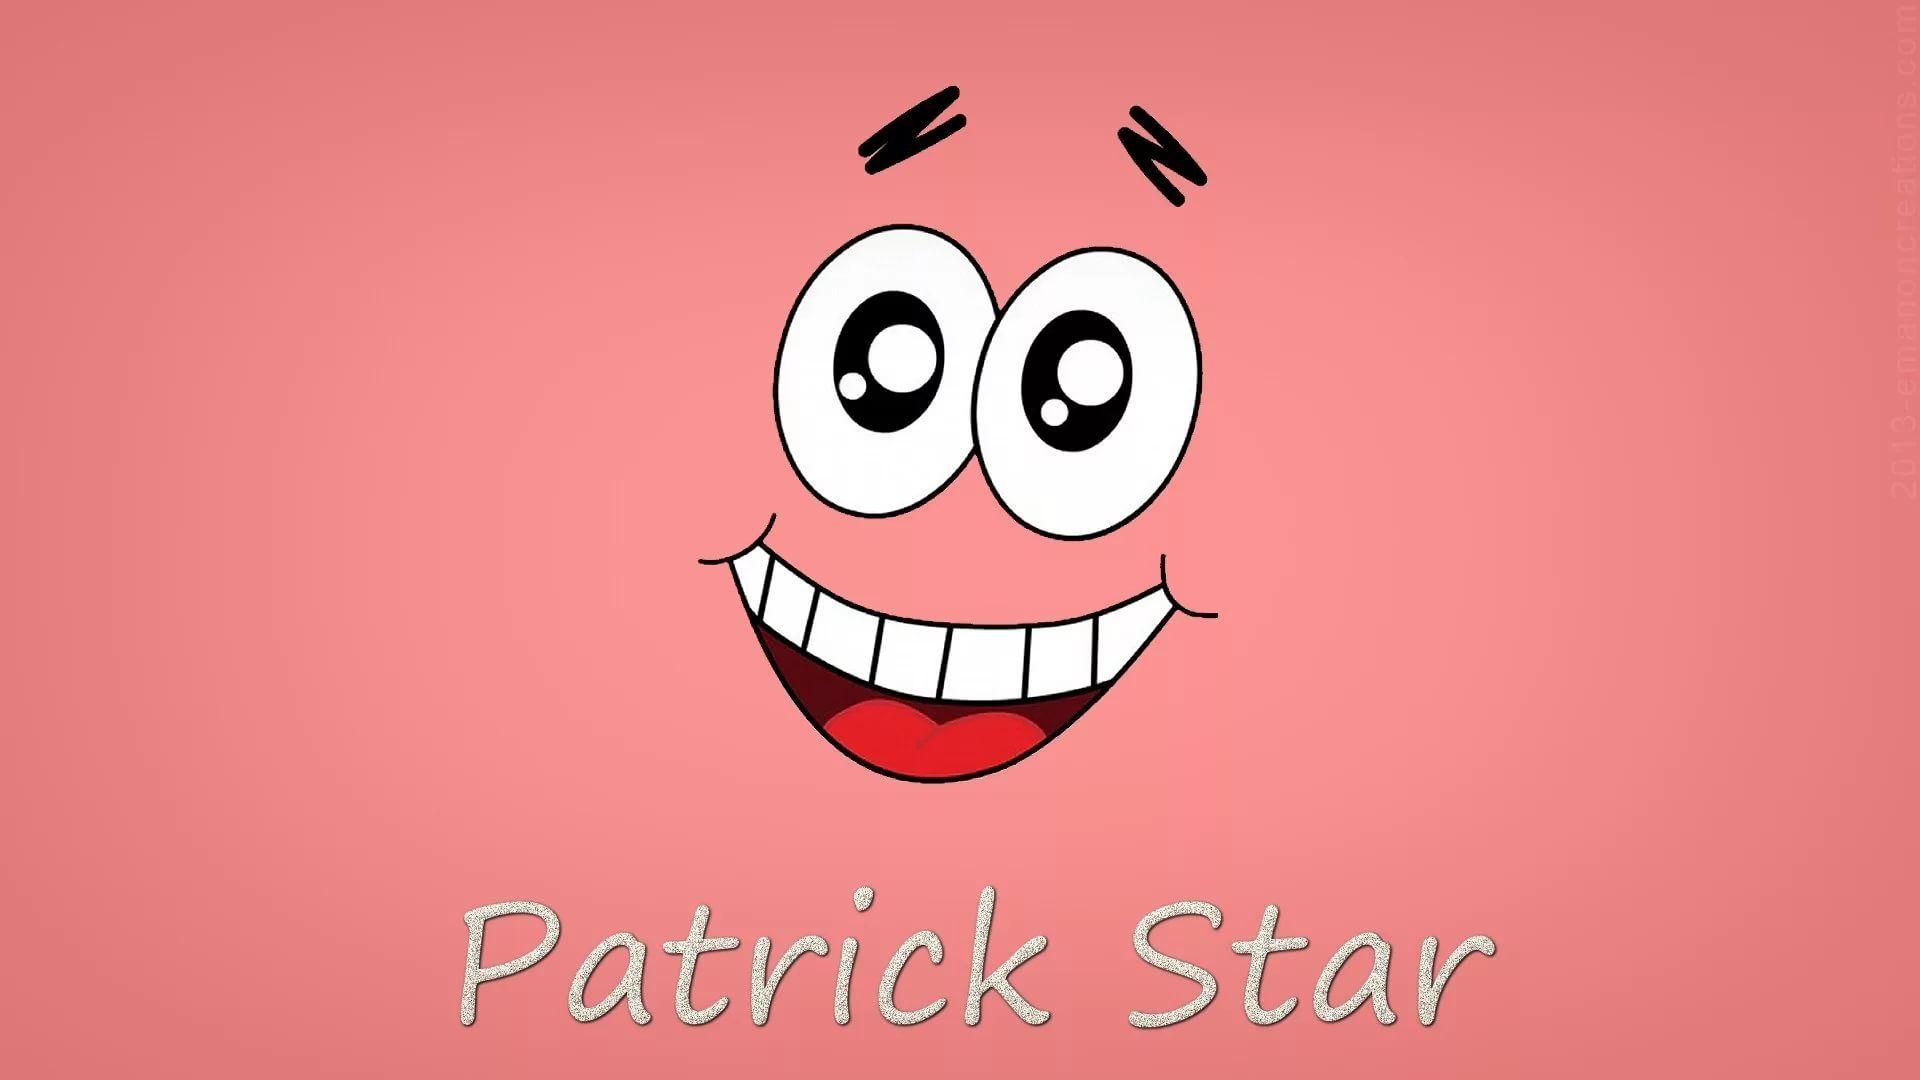 Patrick hd wallpaper 1080p for pc